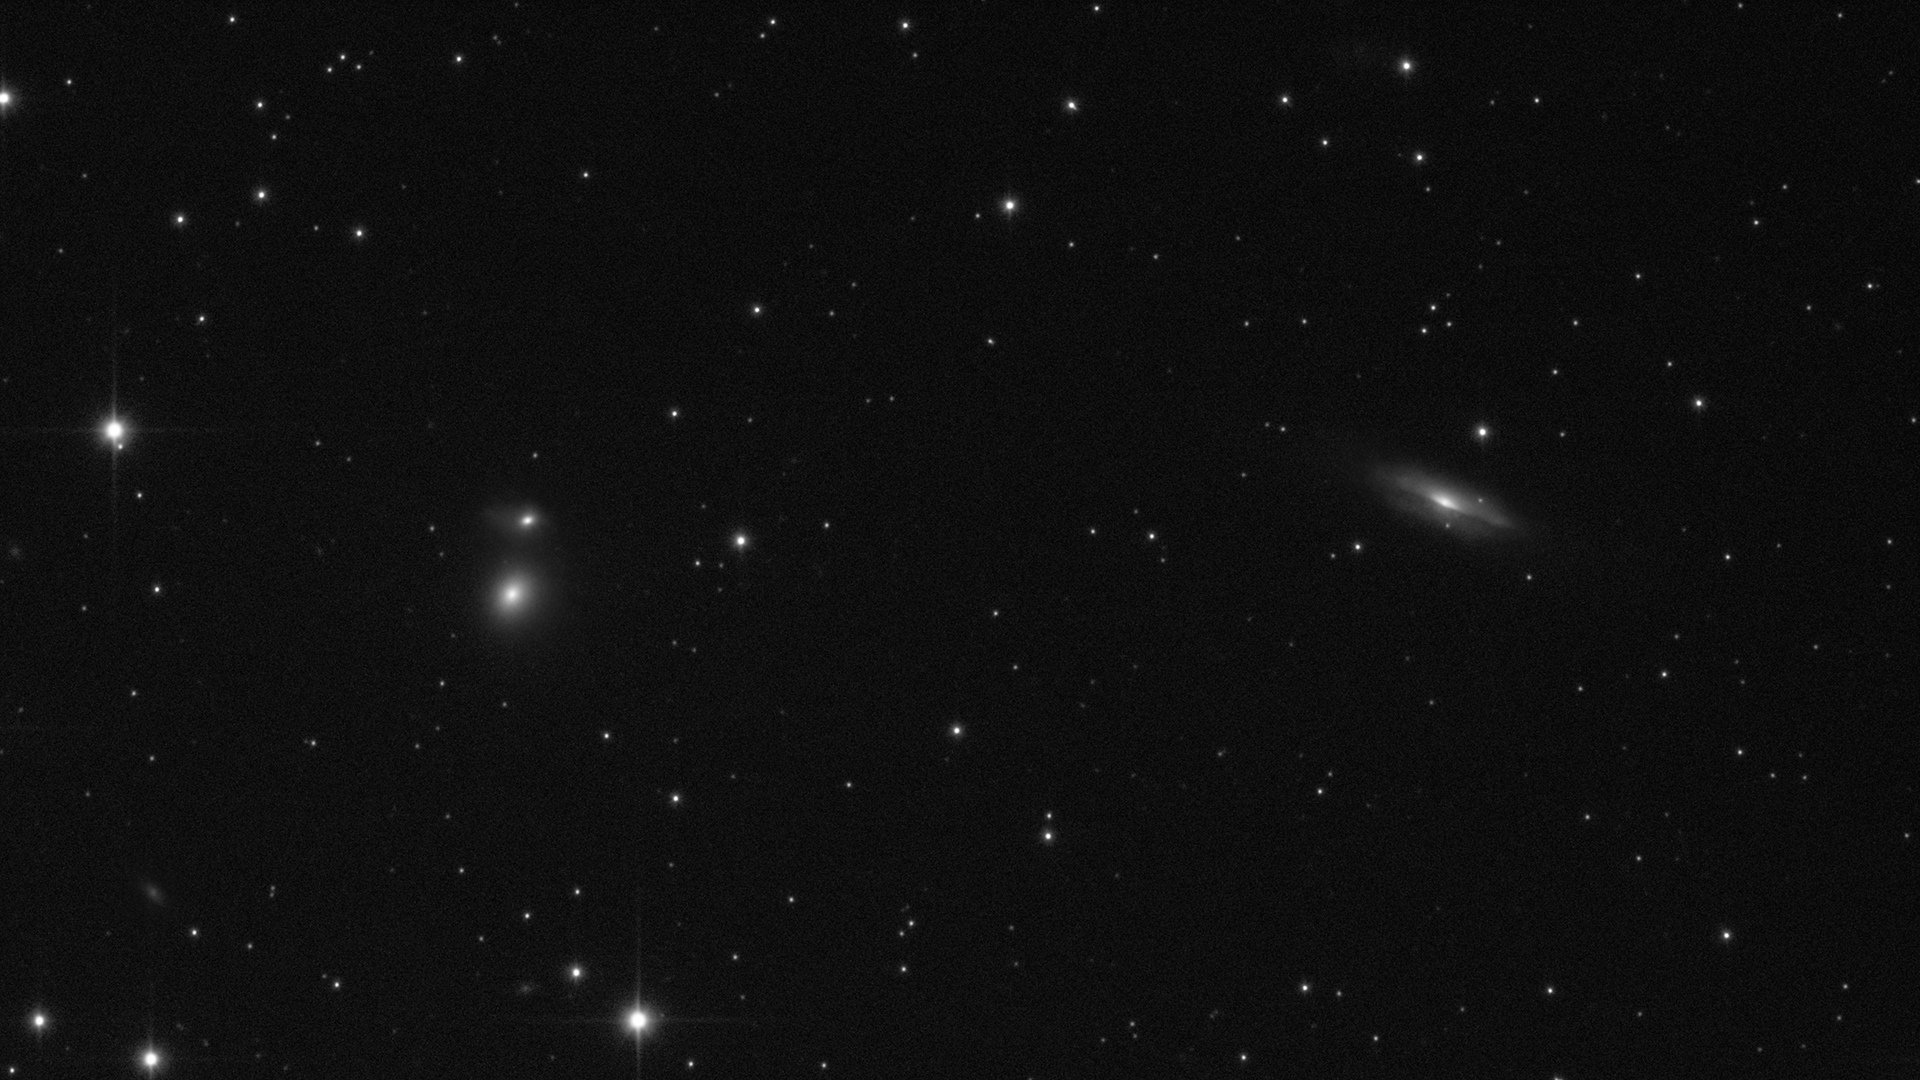 r_pp_NGC1589_stacked.jpg.cb43c1bb3e4cc47f7a8e6b2123a432c1.jpg